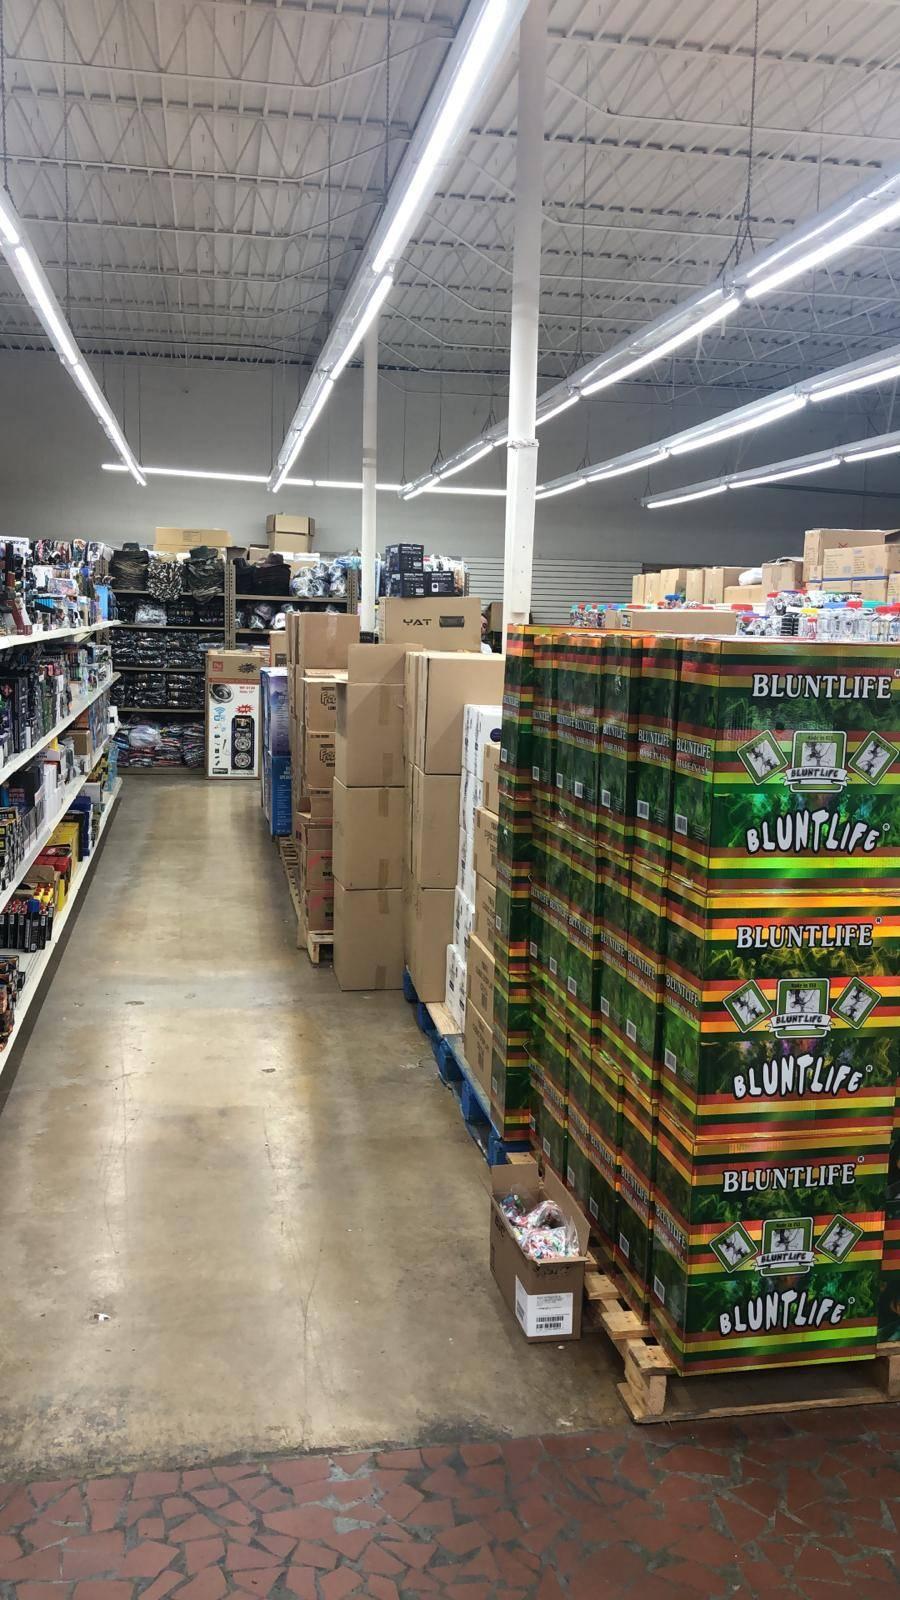 EXPRESS NOVELTY INC. - store  | Photo 3 of 6 | Address: 1612 Getwell Rd, Memphis, TN 38111, USA | Phone: (901) 474-7419